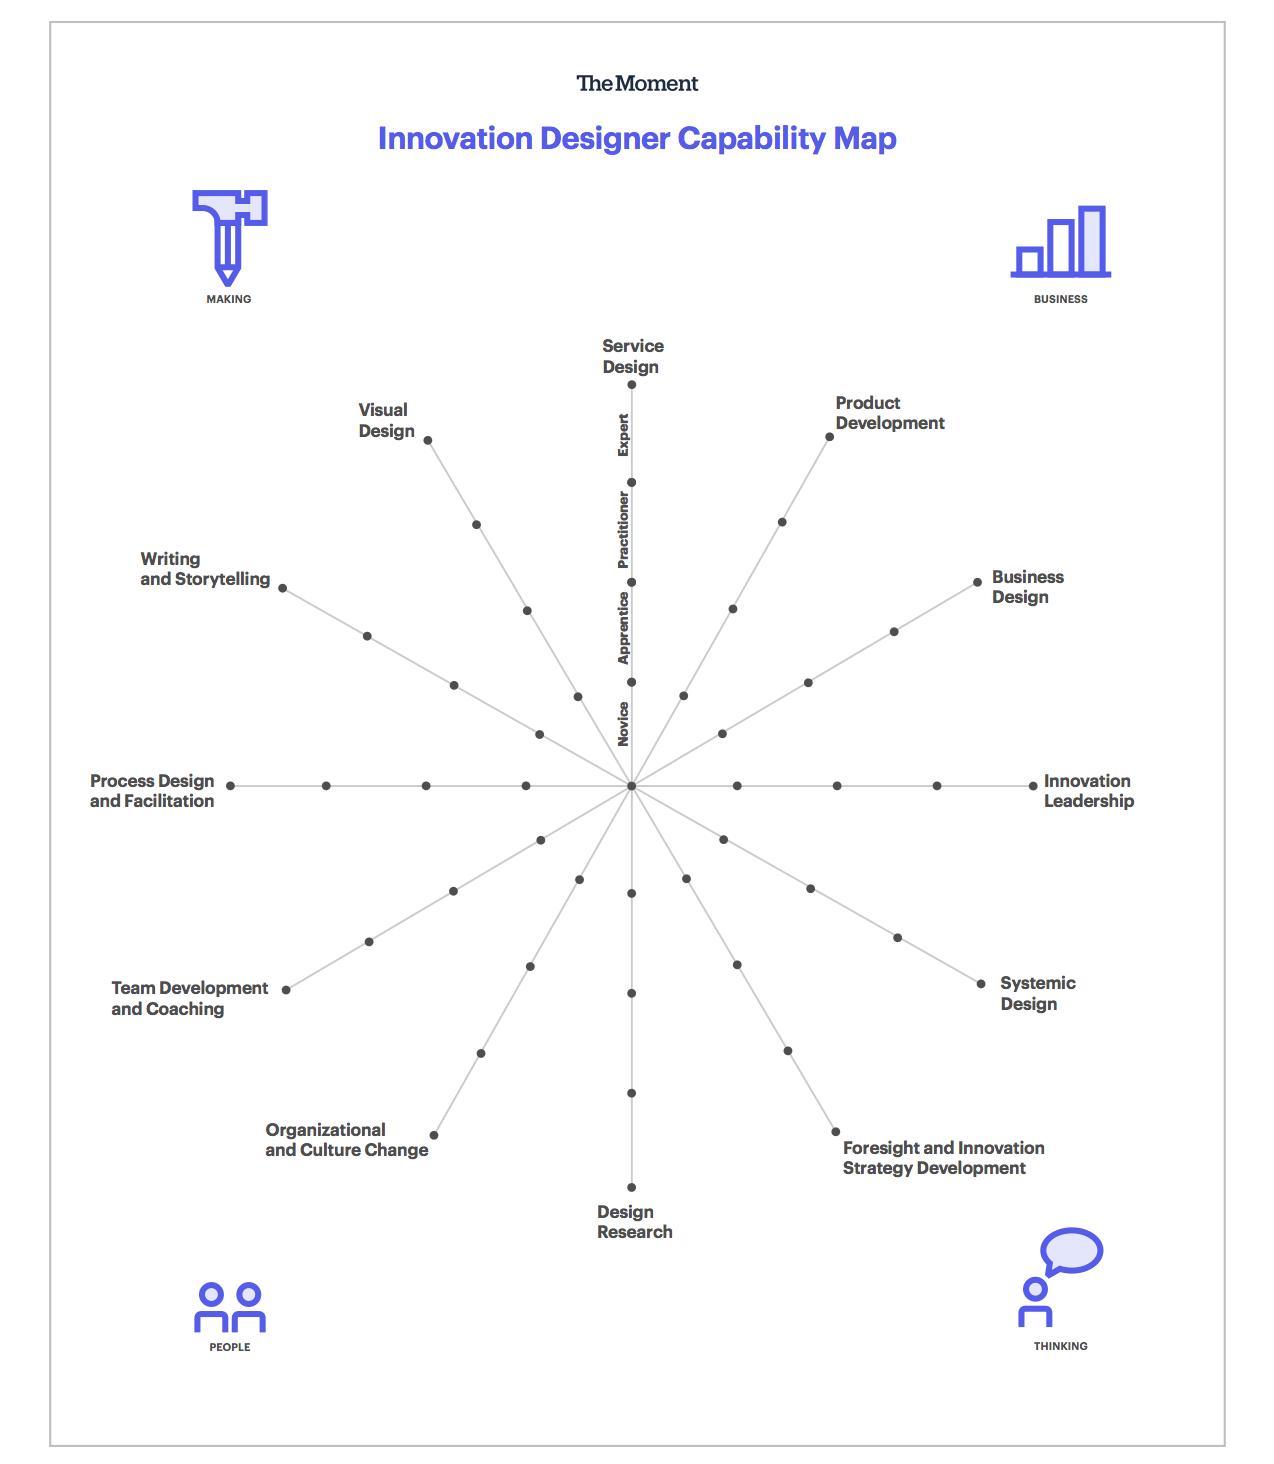 "12 skills on the The Moment's Innovation Designer Capability Map (<a href=""https://cdn2.hubspot.net/hubfs/3903042/themoment_InnovationDesignersCapabilityMap.pdf"